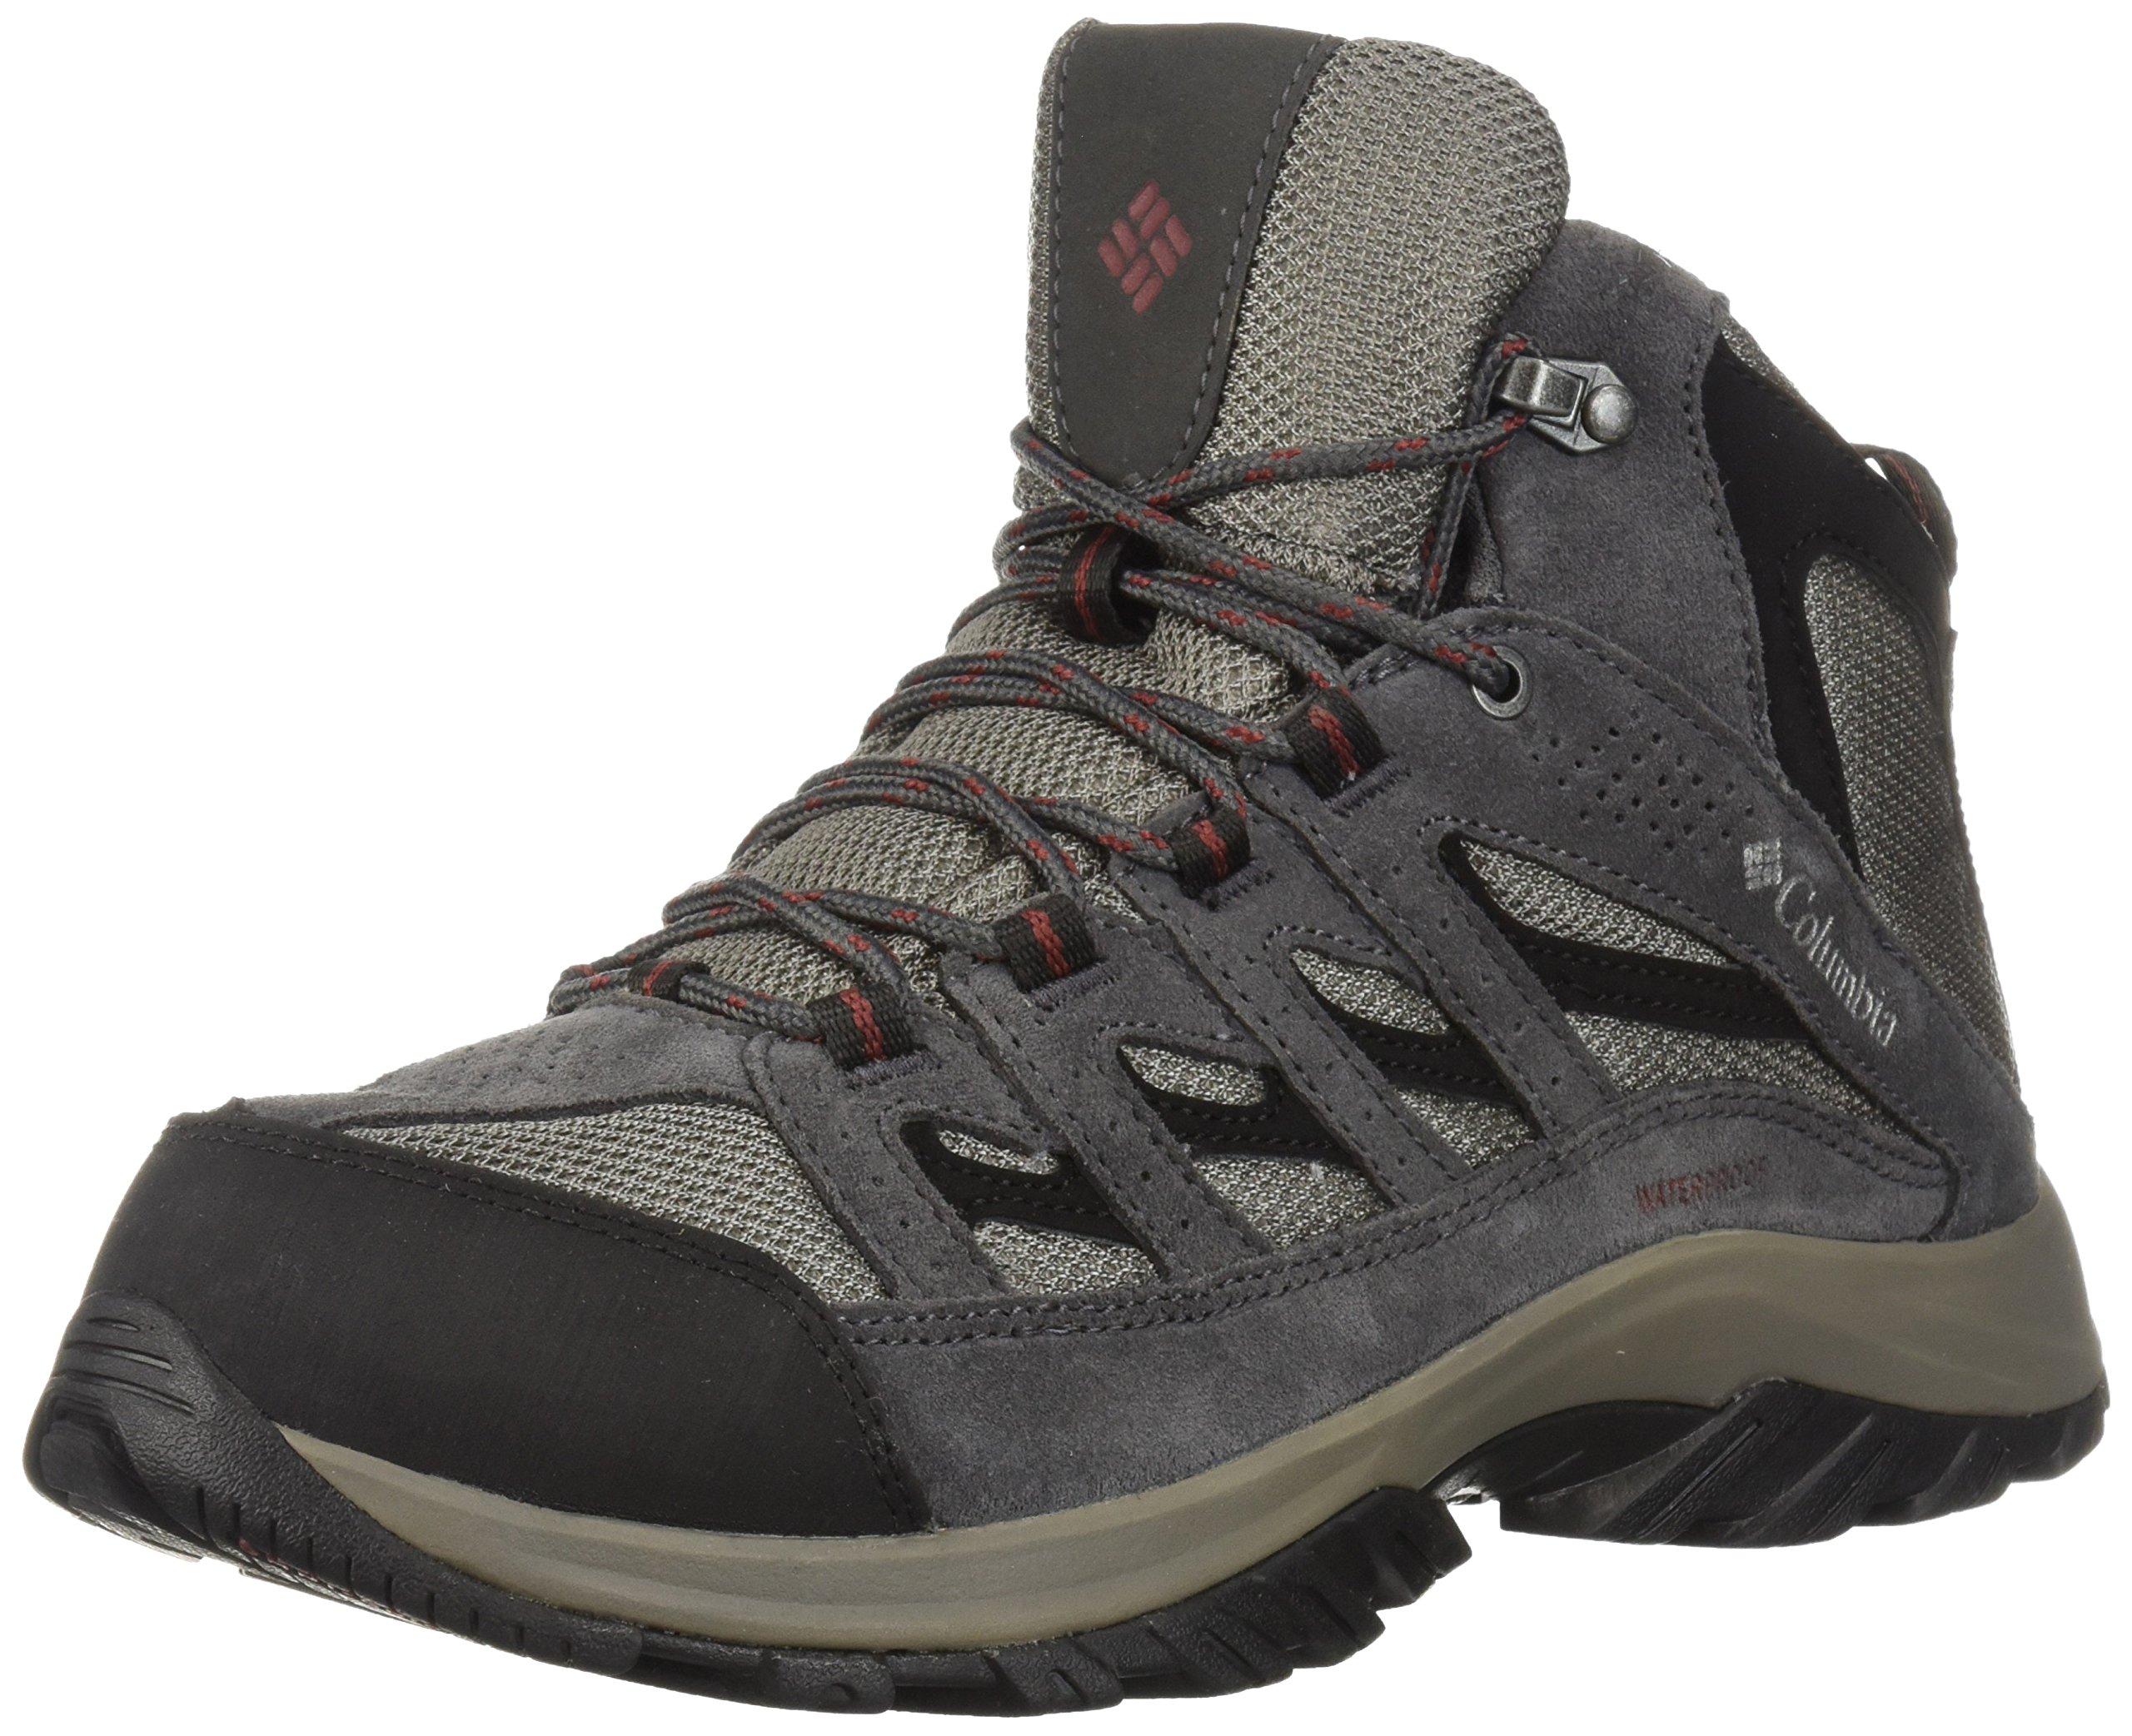 Columbia Men's Crestwood MID Waterproof Hiking Boot, Quarry, Deep Rust, 14 Wide US